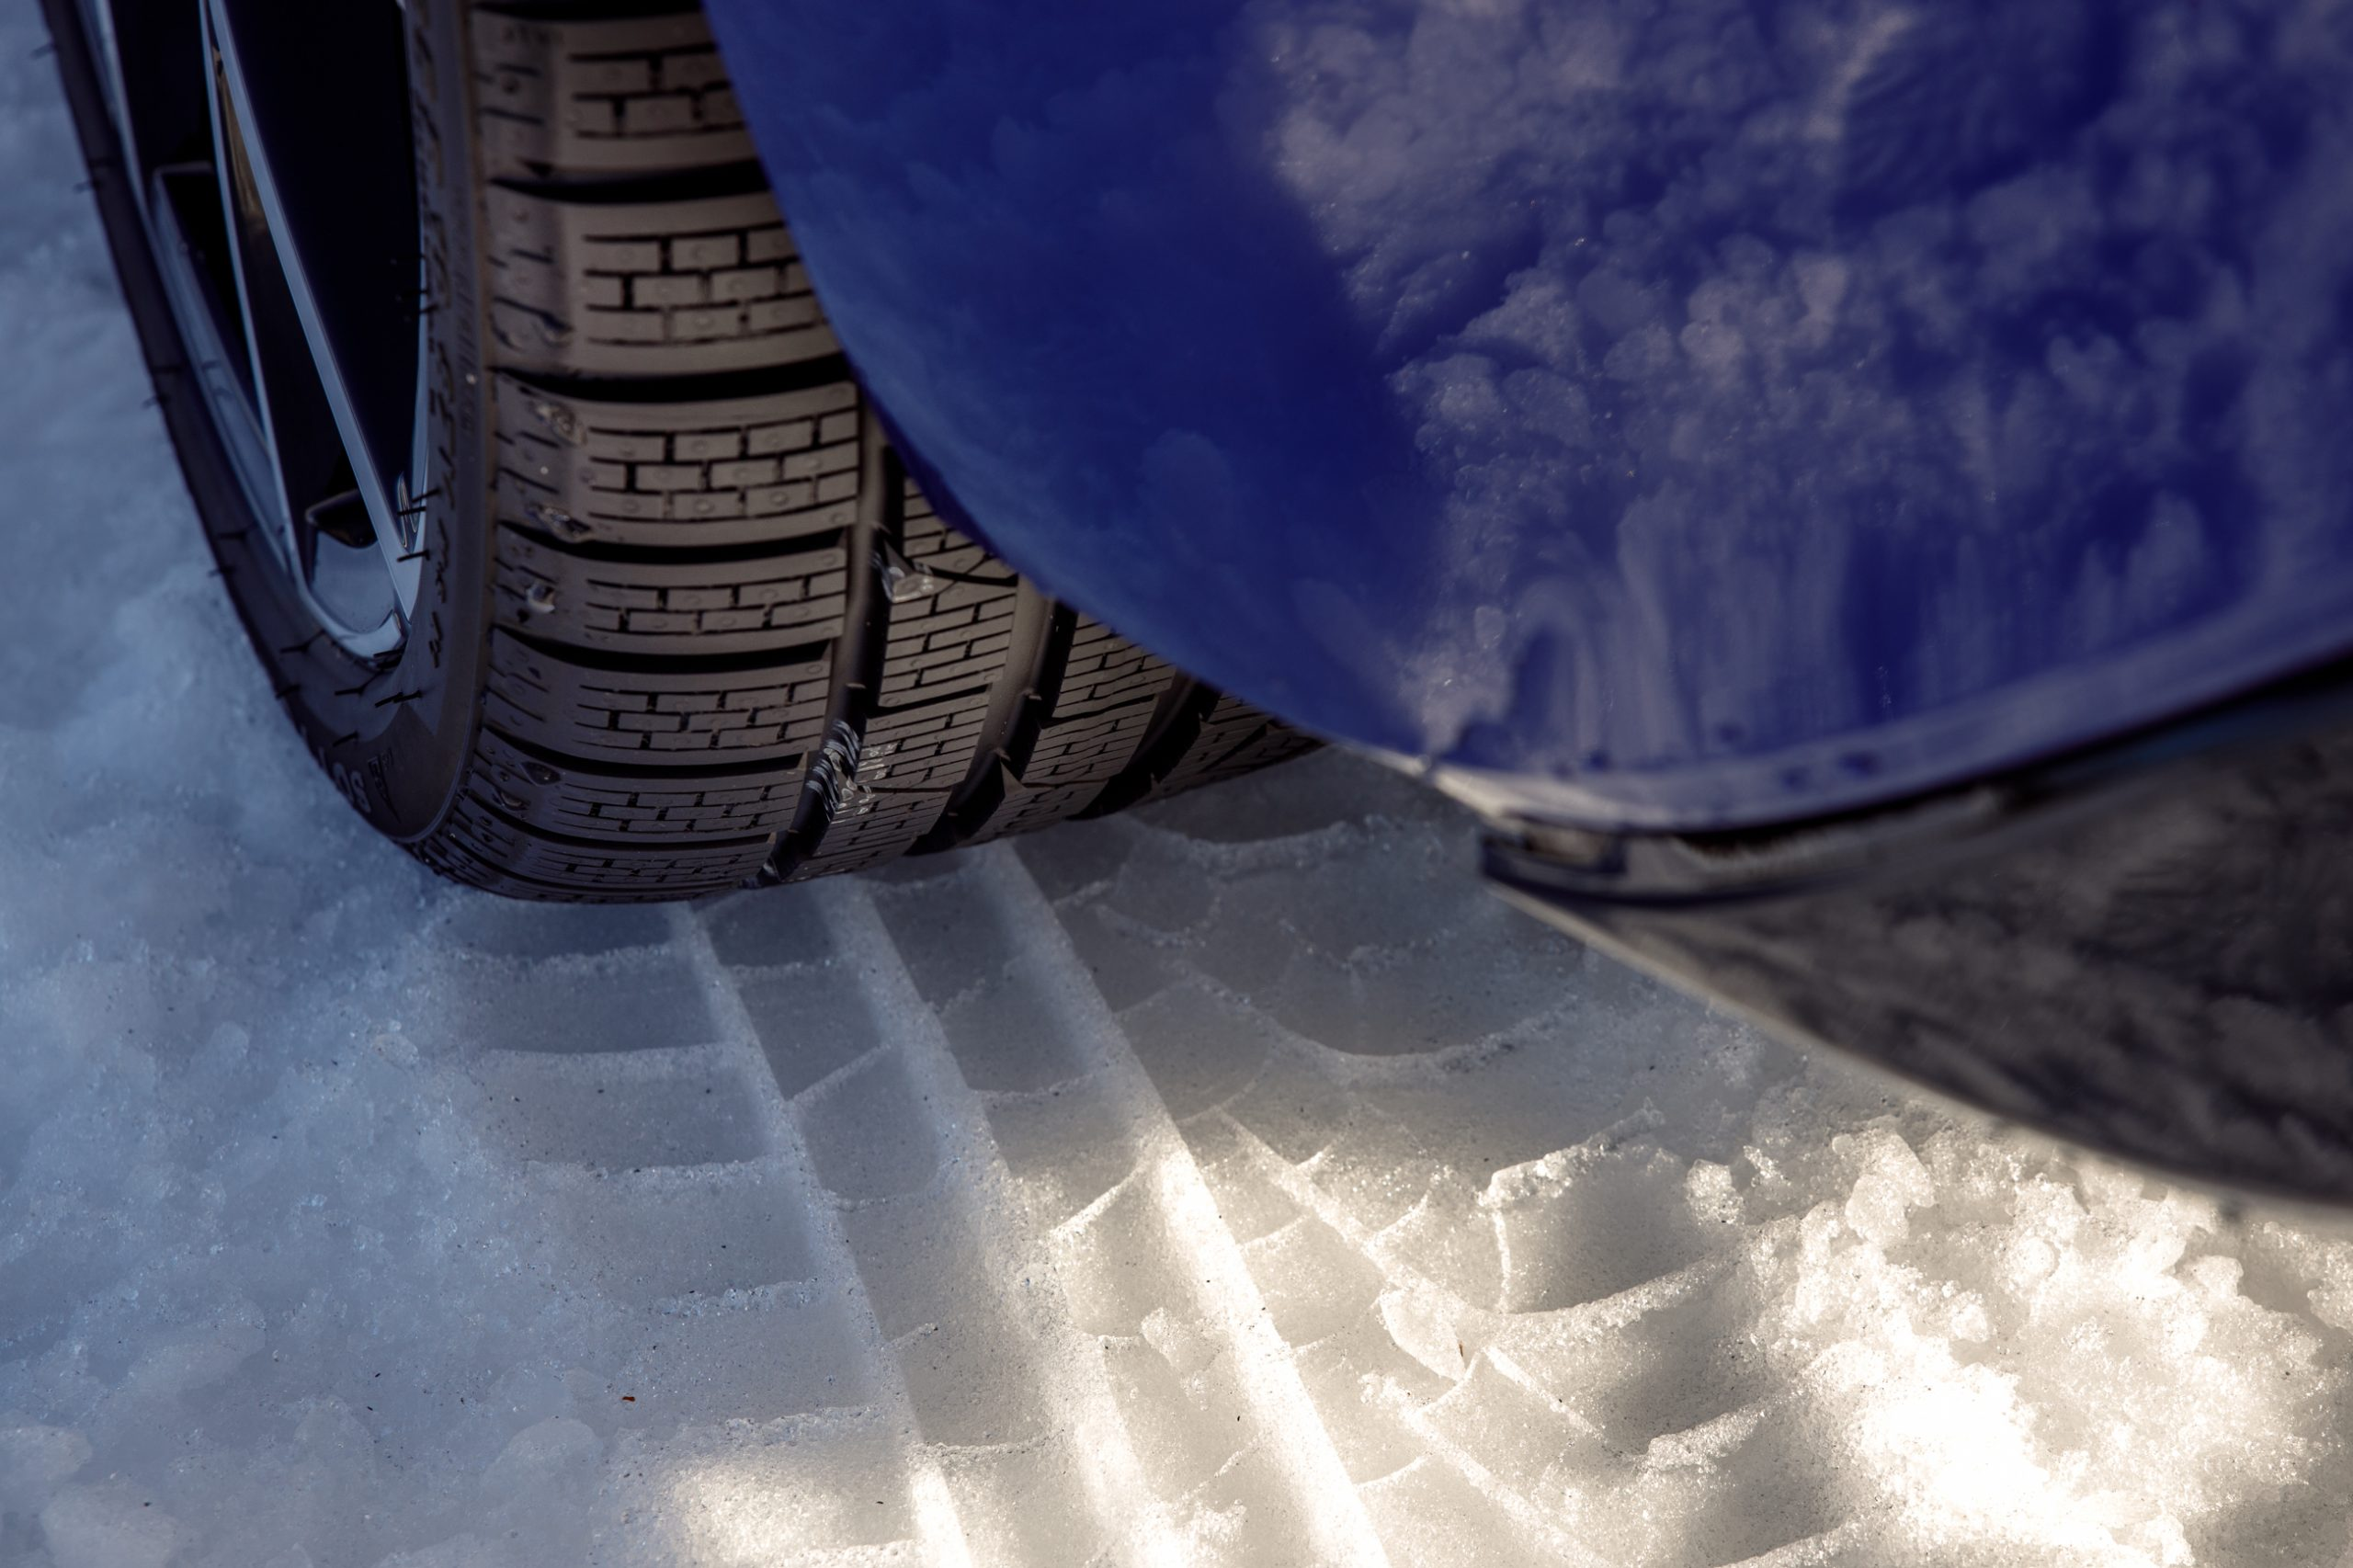 2022 Volkswagen Golf R winter tire tread detail